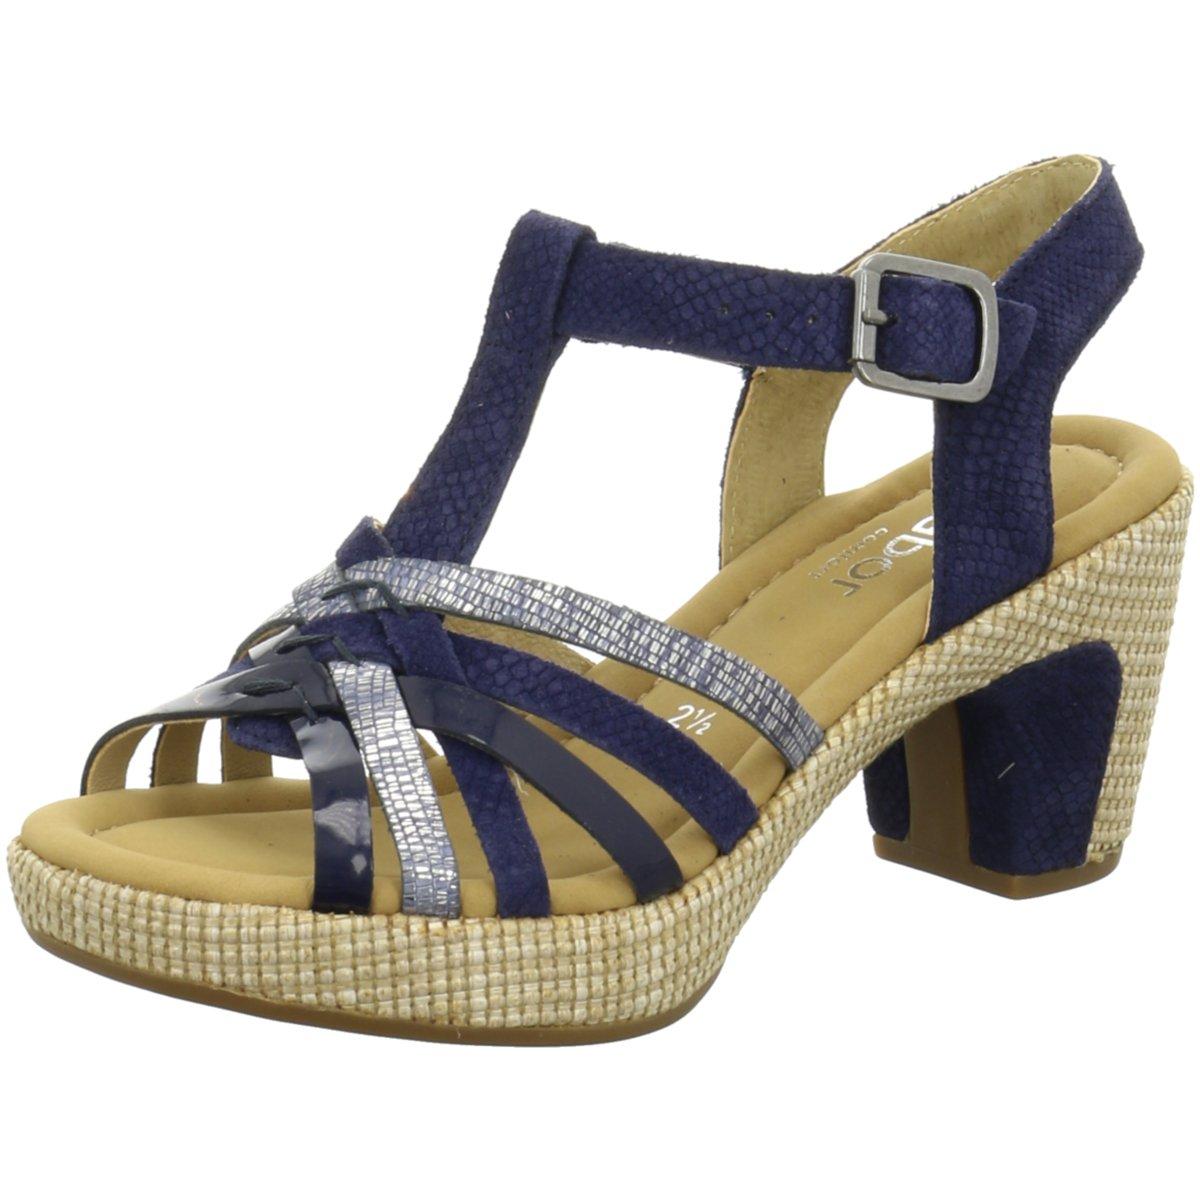 Comfort Sandalette 8273646 65 blau blau Gabor Billig Verkauf